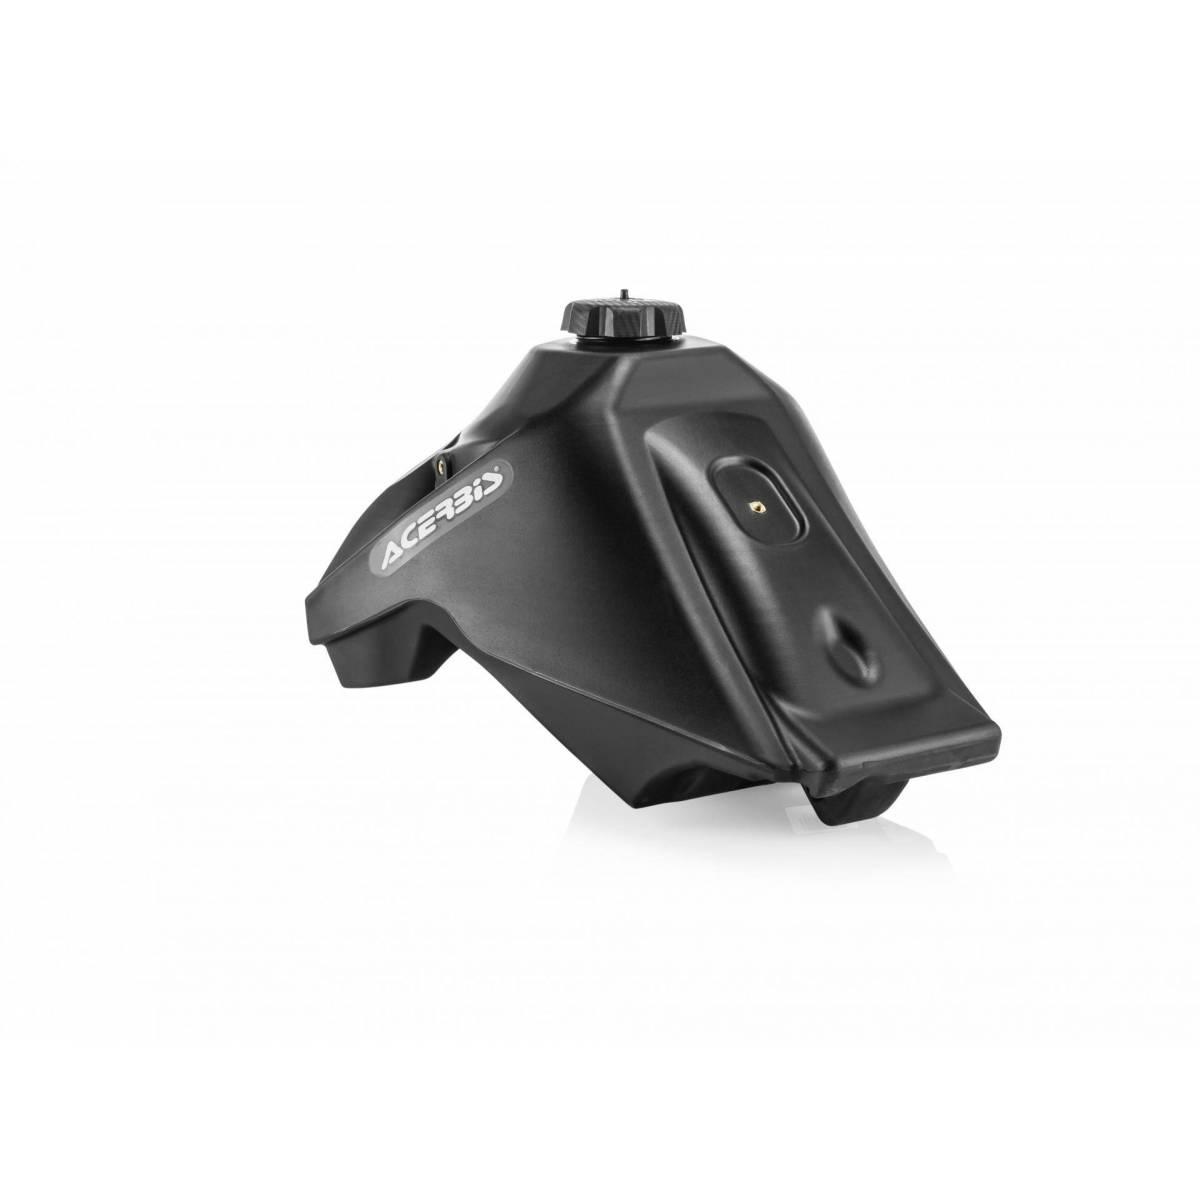 0022925-090 - Deposito Crf 250 L M 12.5L 17 18 Negro